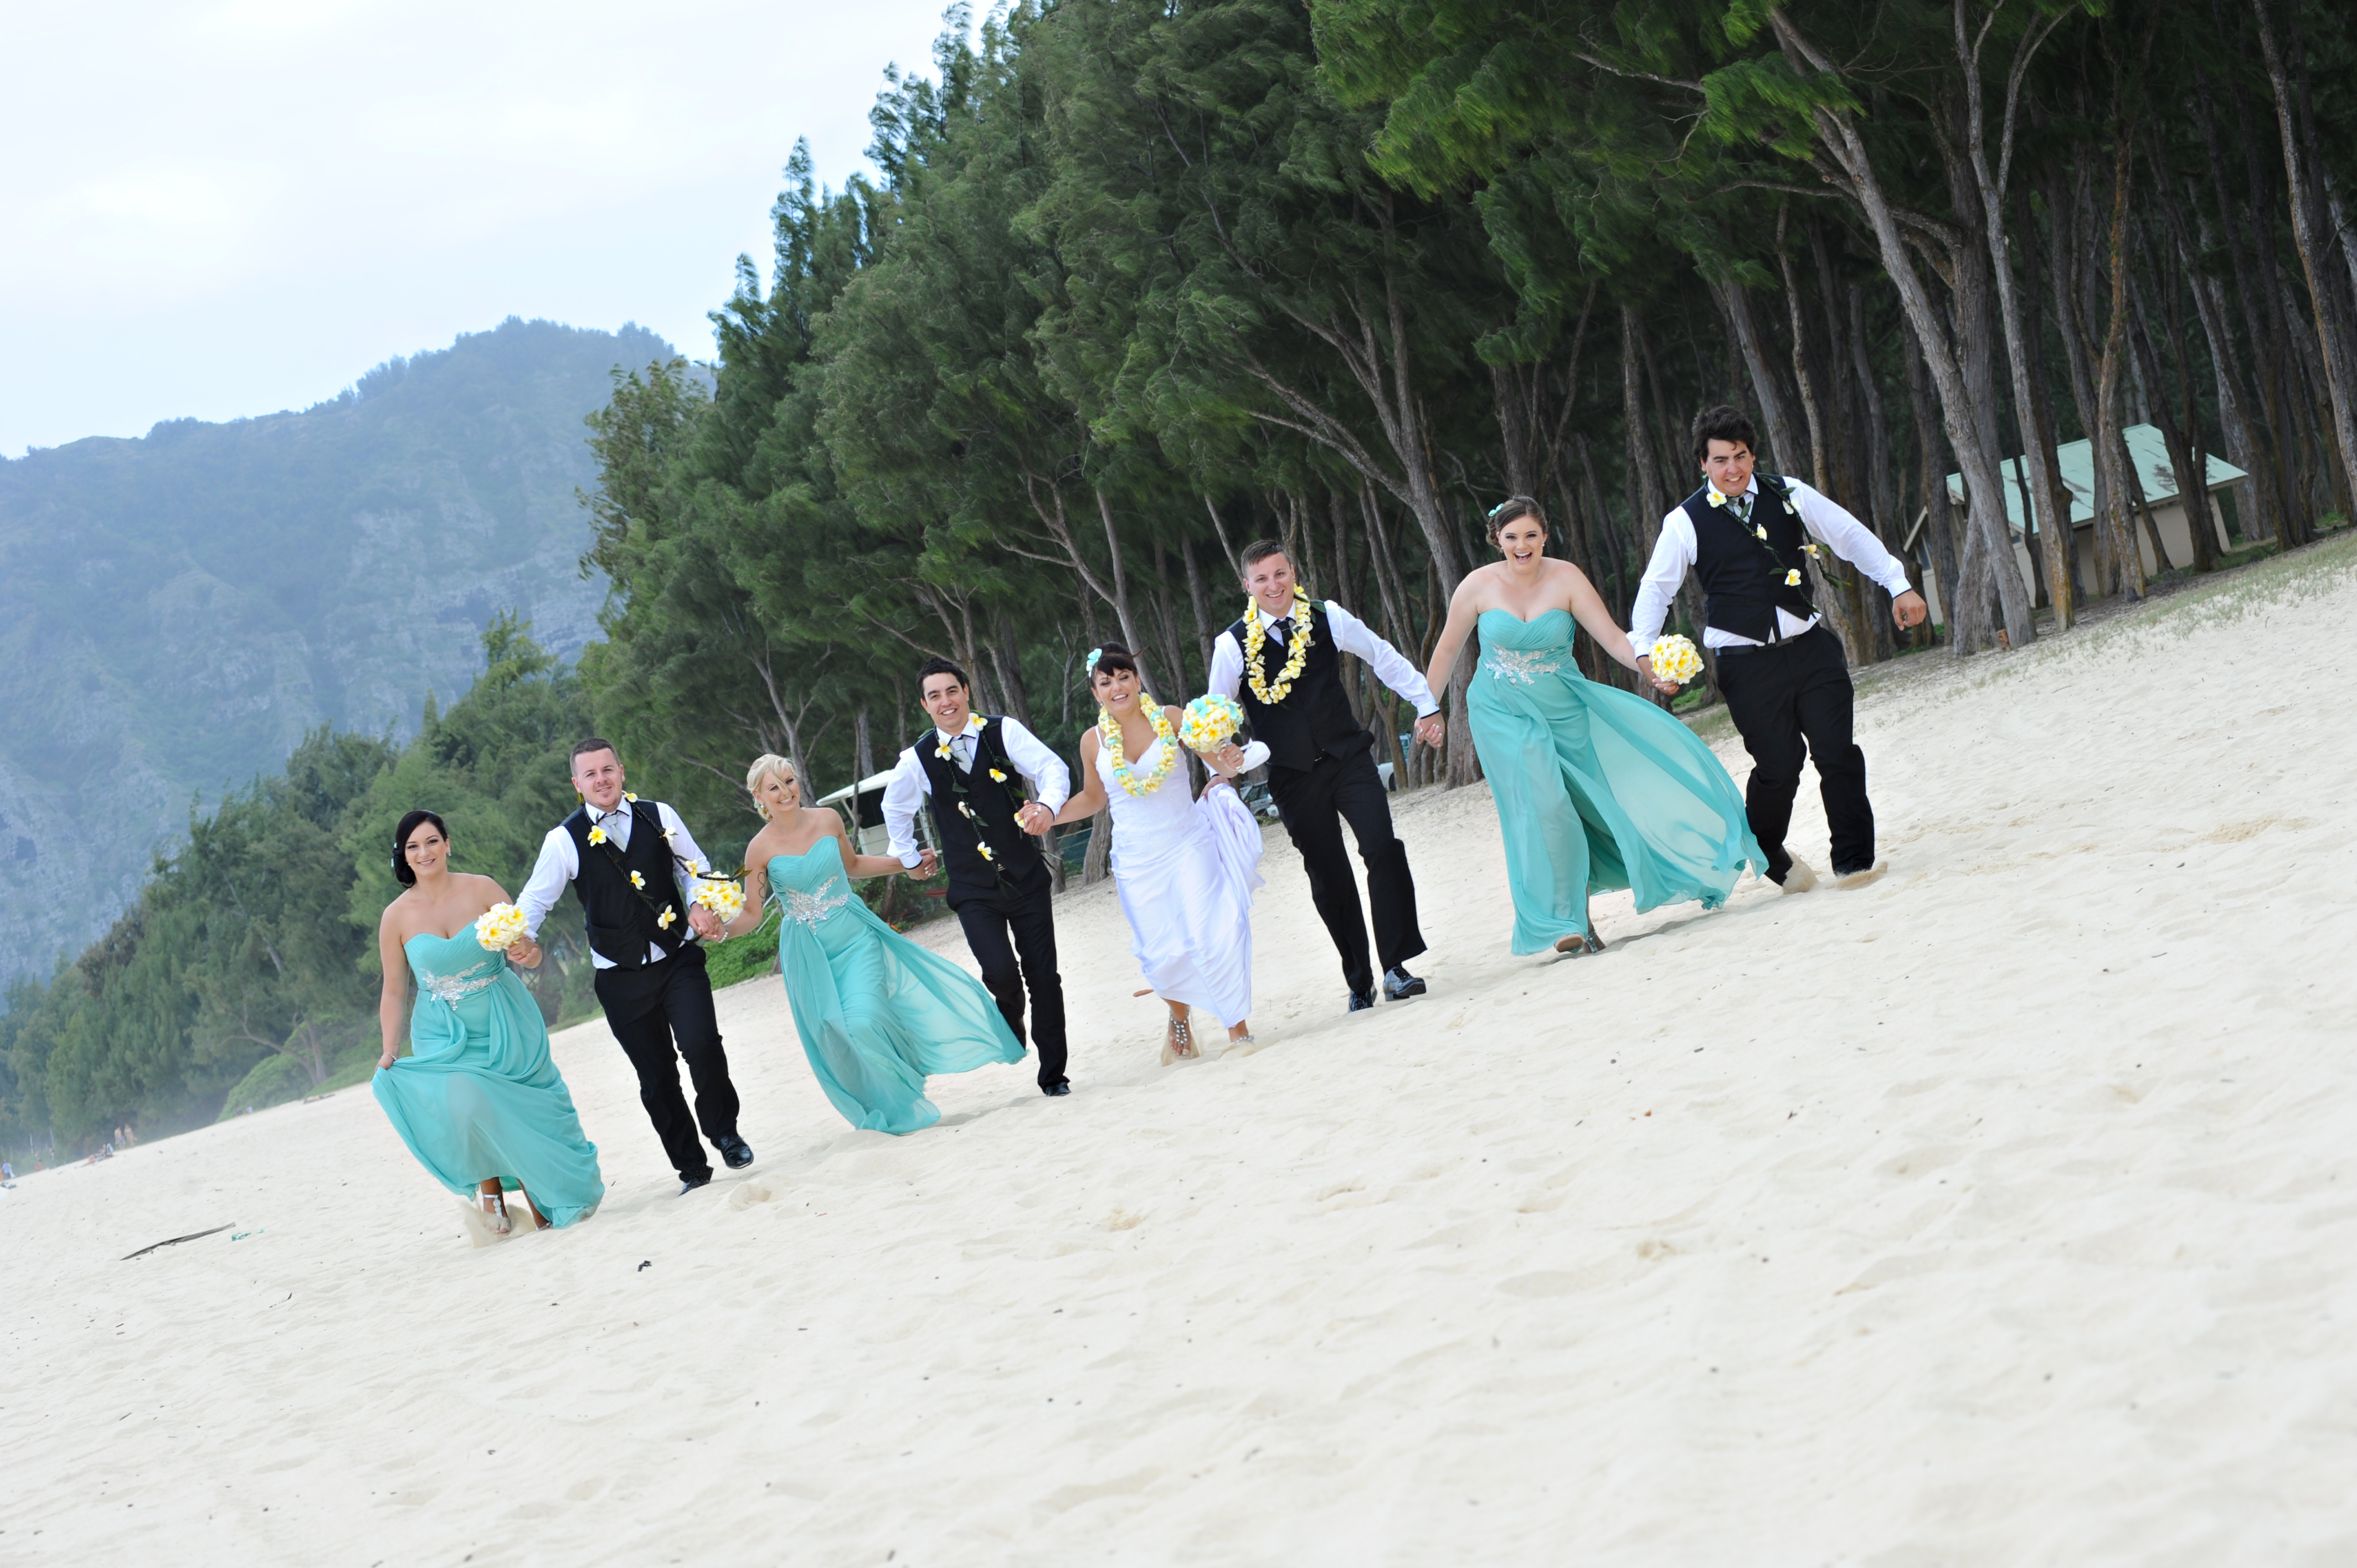 Alohaislandweddings.com- Wedding Picture in Hawaii-18